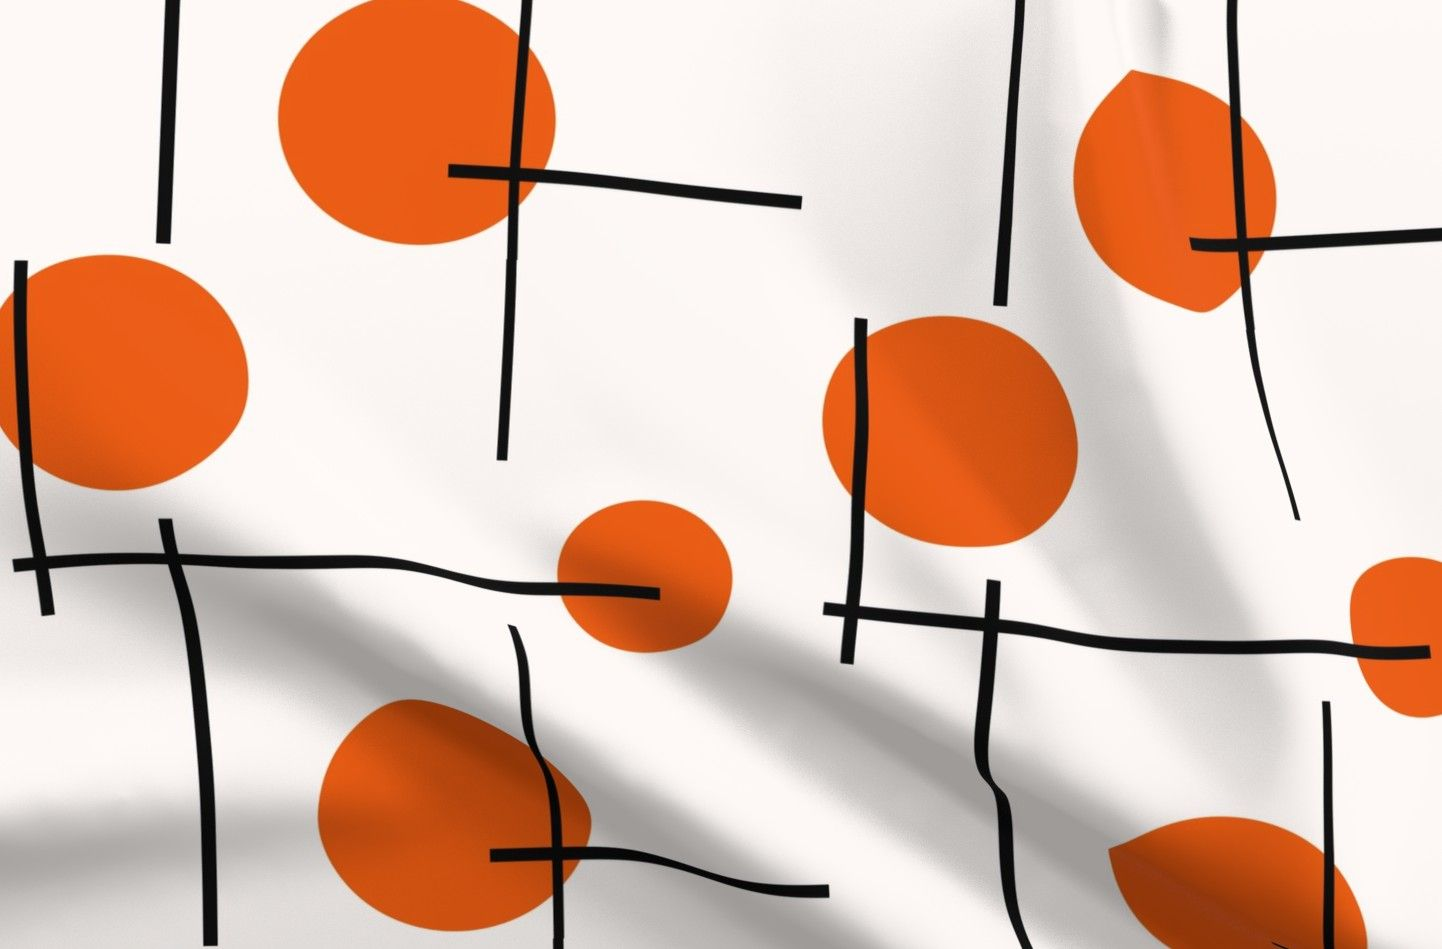 Retro Orange Dots Cotton Jersey Fabric Swatch Mid Century Modern Lines Home Decor Mod Minimalist Summer 1960S  By Spoonflower